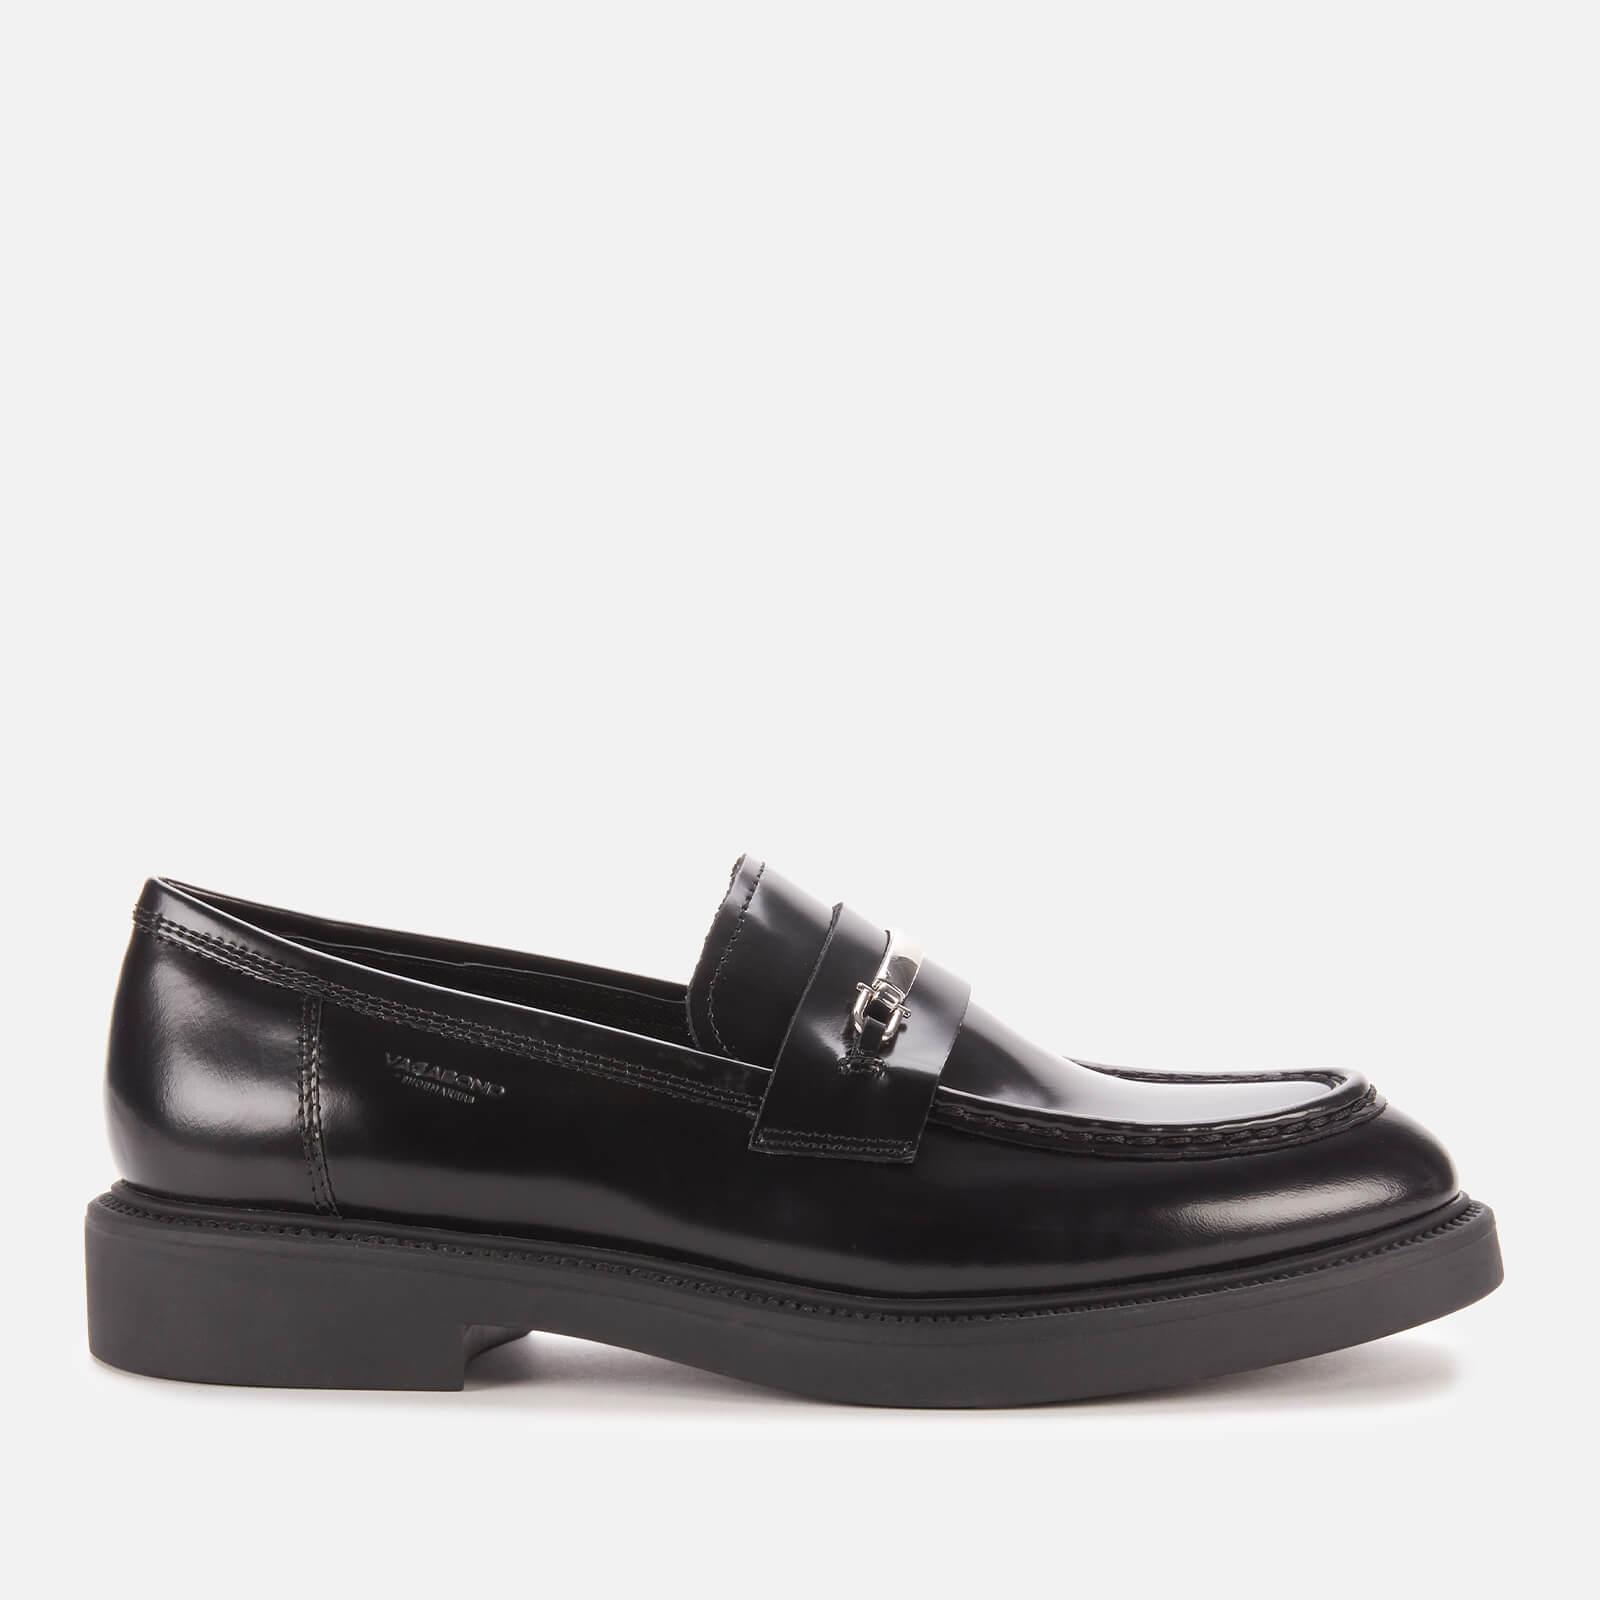 Vagabond Women's Alex W Leather Loafers - Black - Uk 5